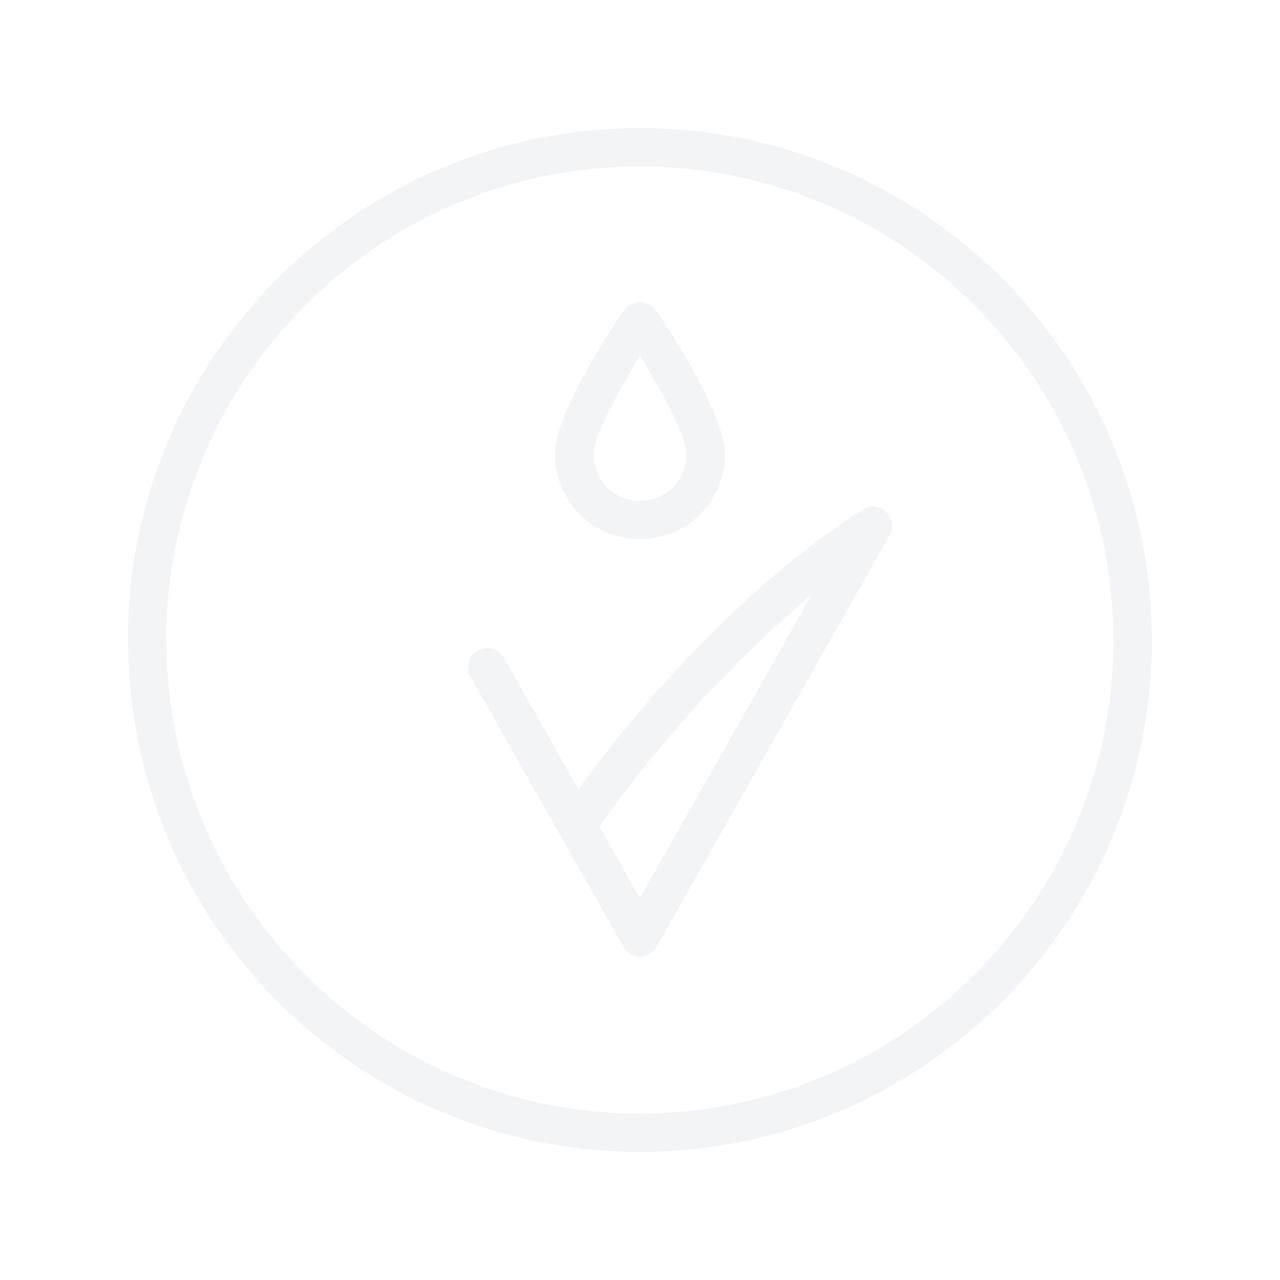 LUUV Rosehip Body Cream For Dry Skin 200ml